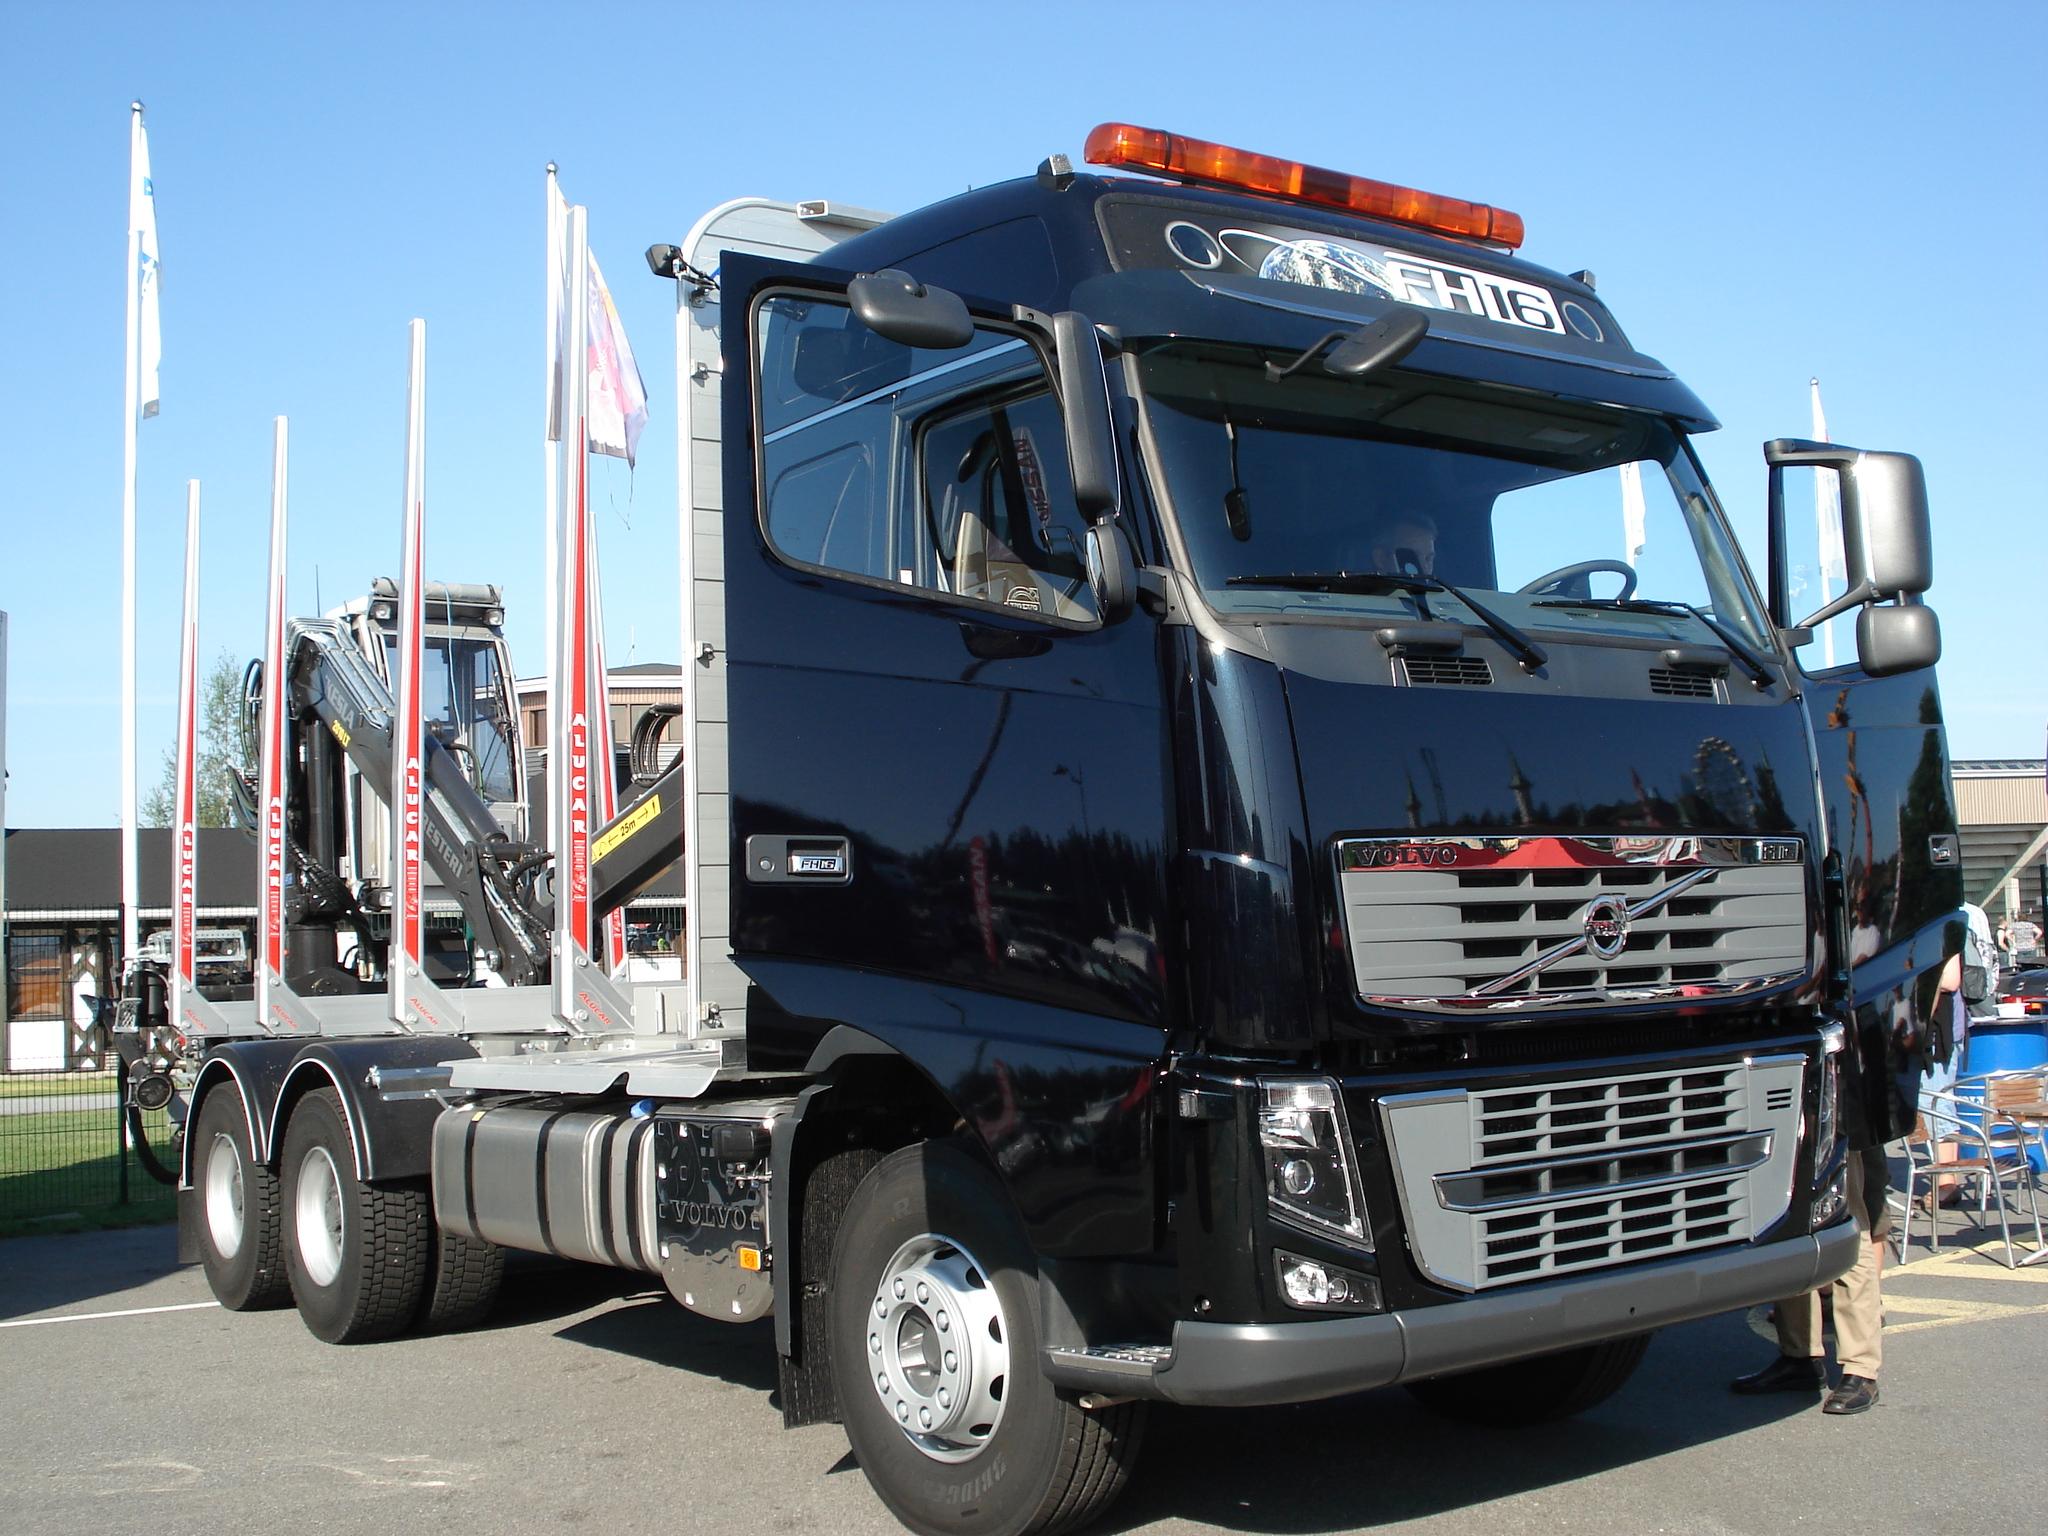 Photo Camion Volvo Decore Prost